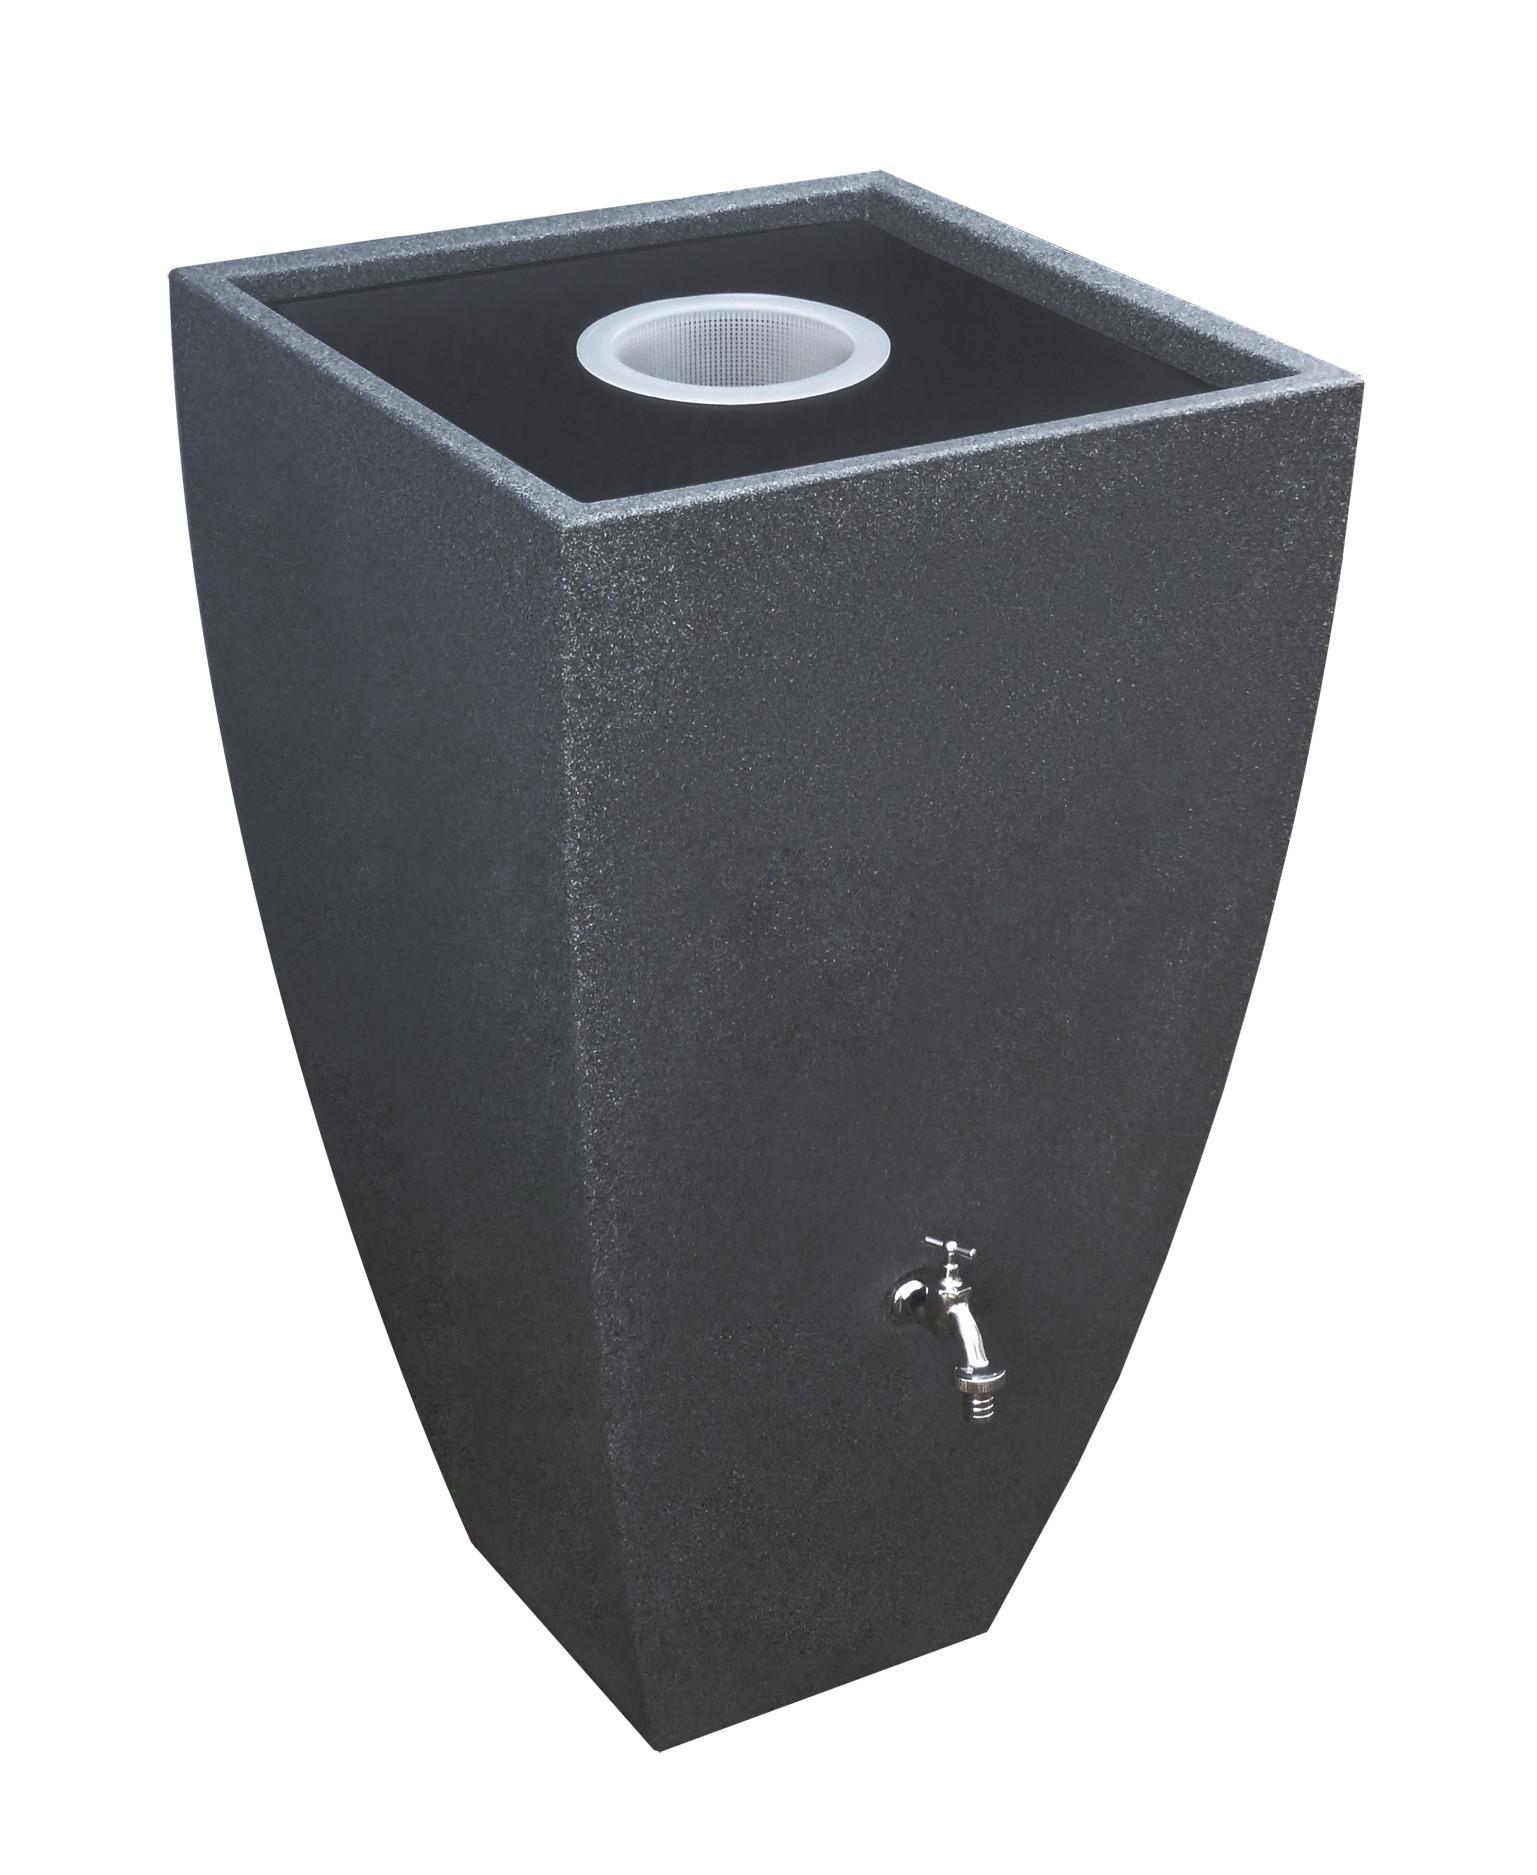 regentonne regenwassertank 200 l rewatec modena black granit bei. Black Bedroom Furniture Sets. Home Design Ideas